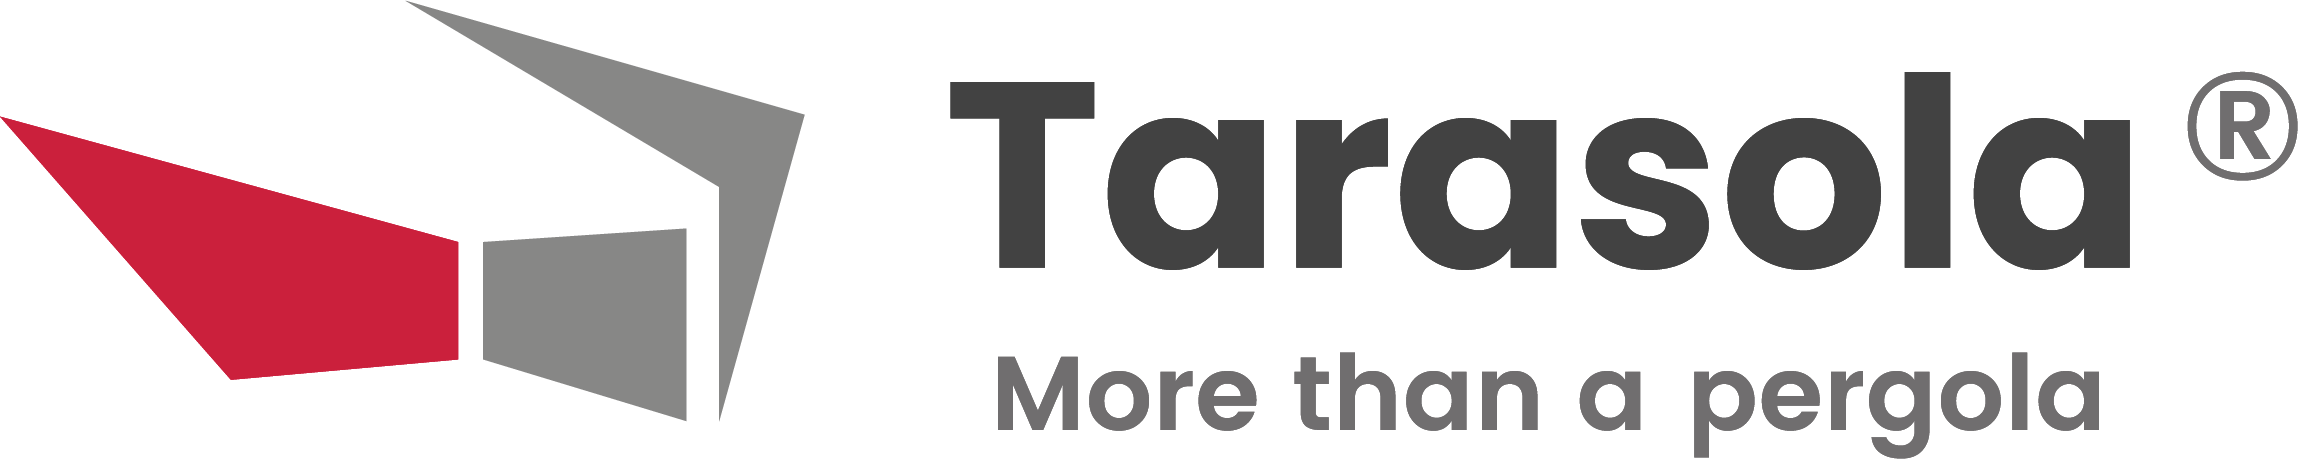 Tarasola - roofing of the terrace and garden Tarasola